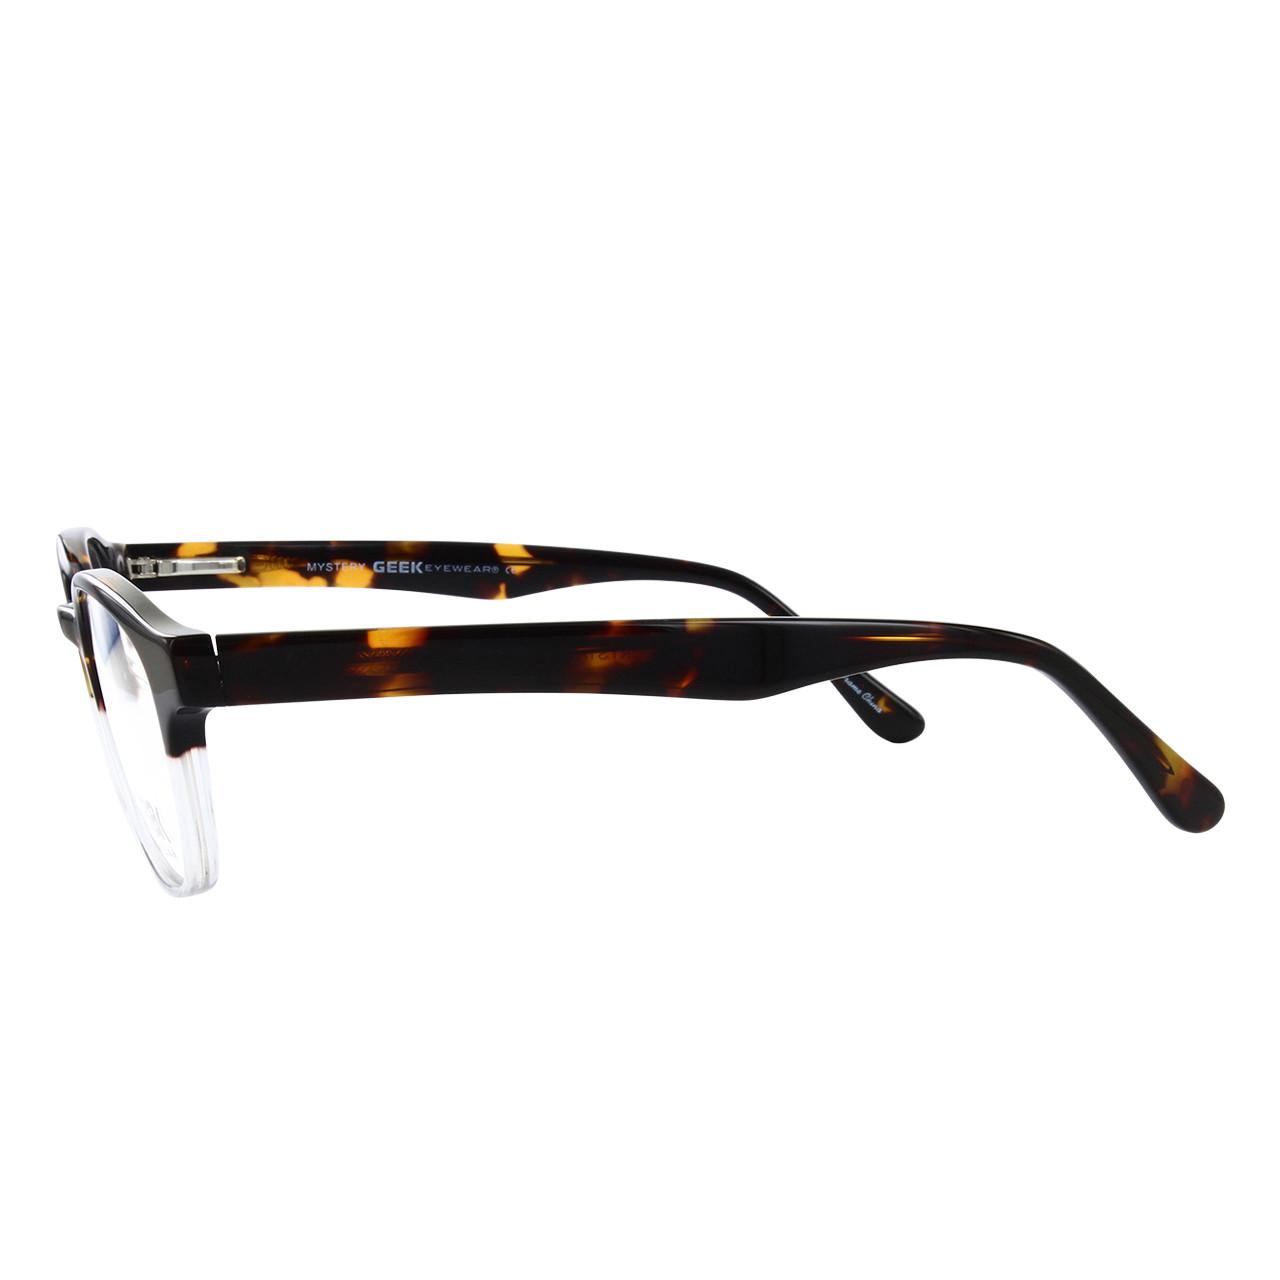 GEEK Eyewear GEEK Mystery